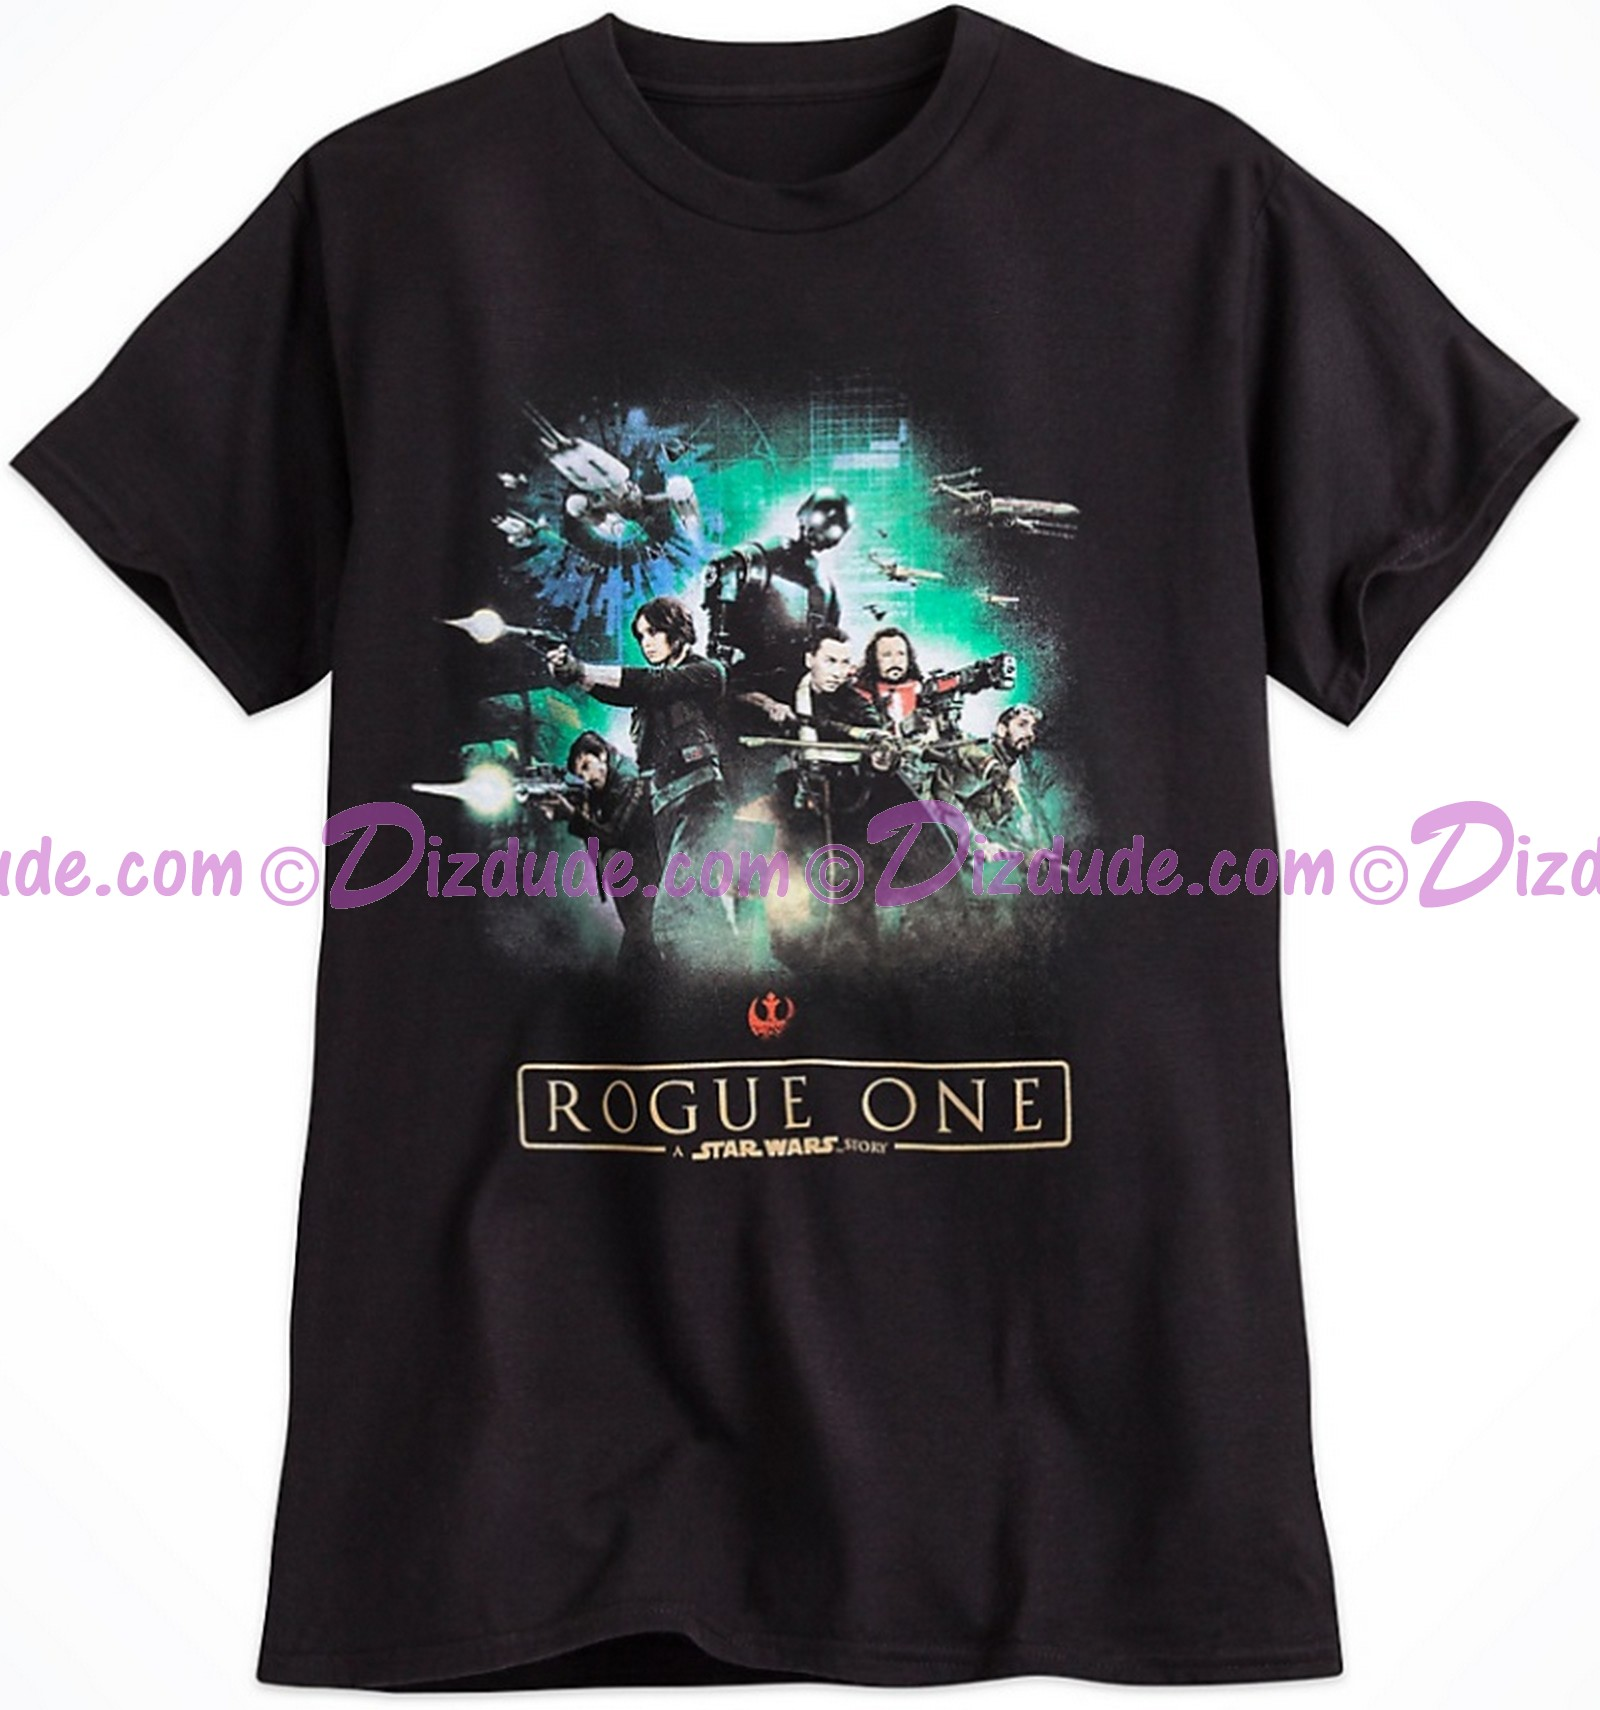 Rogue One Rebel Adult T-Shirt (Tshirt, T shirt or Tee) - Disney's Star Wars